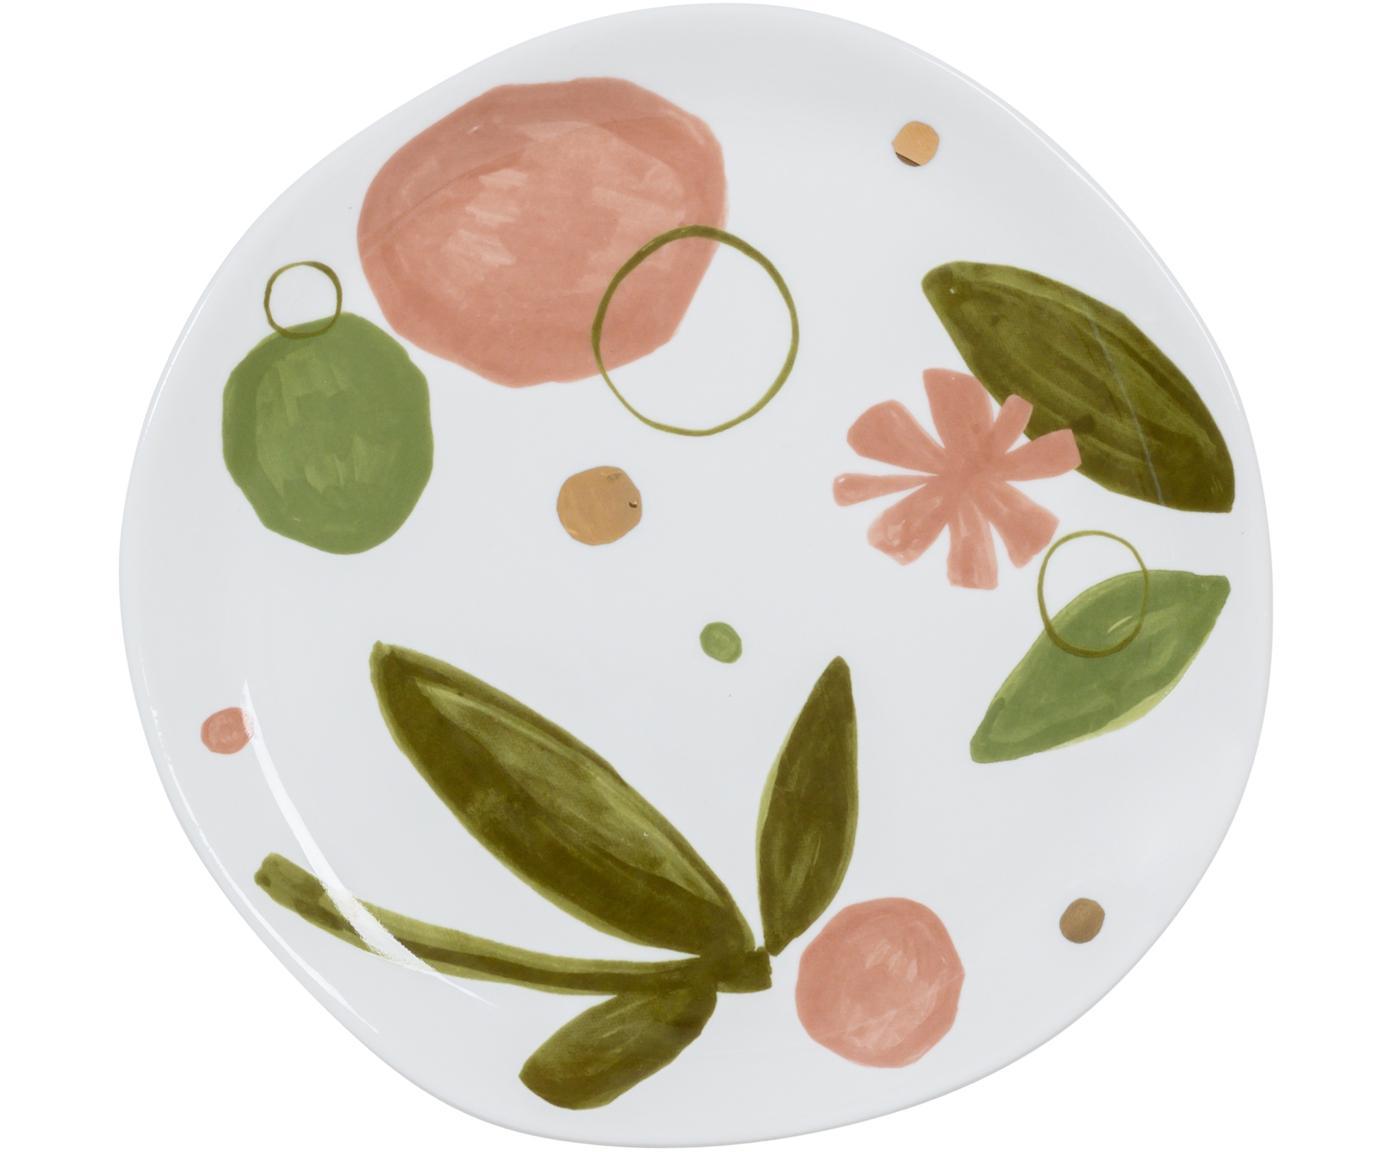 Ontbijtbord Expressive, New Bone China, Wit, roze, groen, goudkleurig, Ø 17 cm